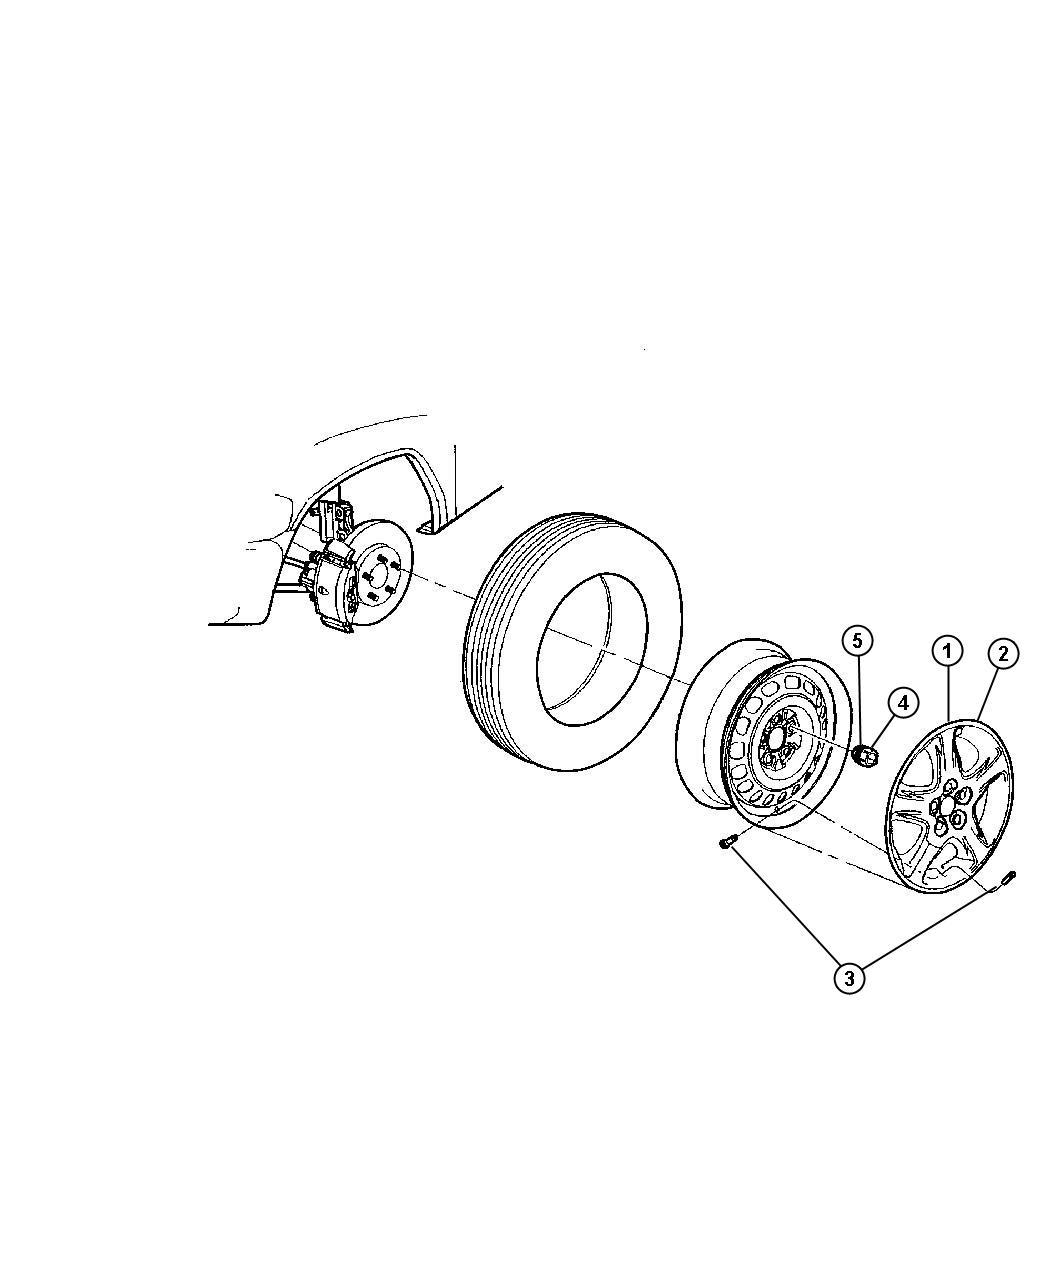 2002 Dodge Grand Caravan Cover. Wheel. 15. [wheel covers